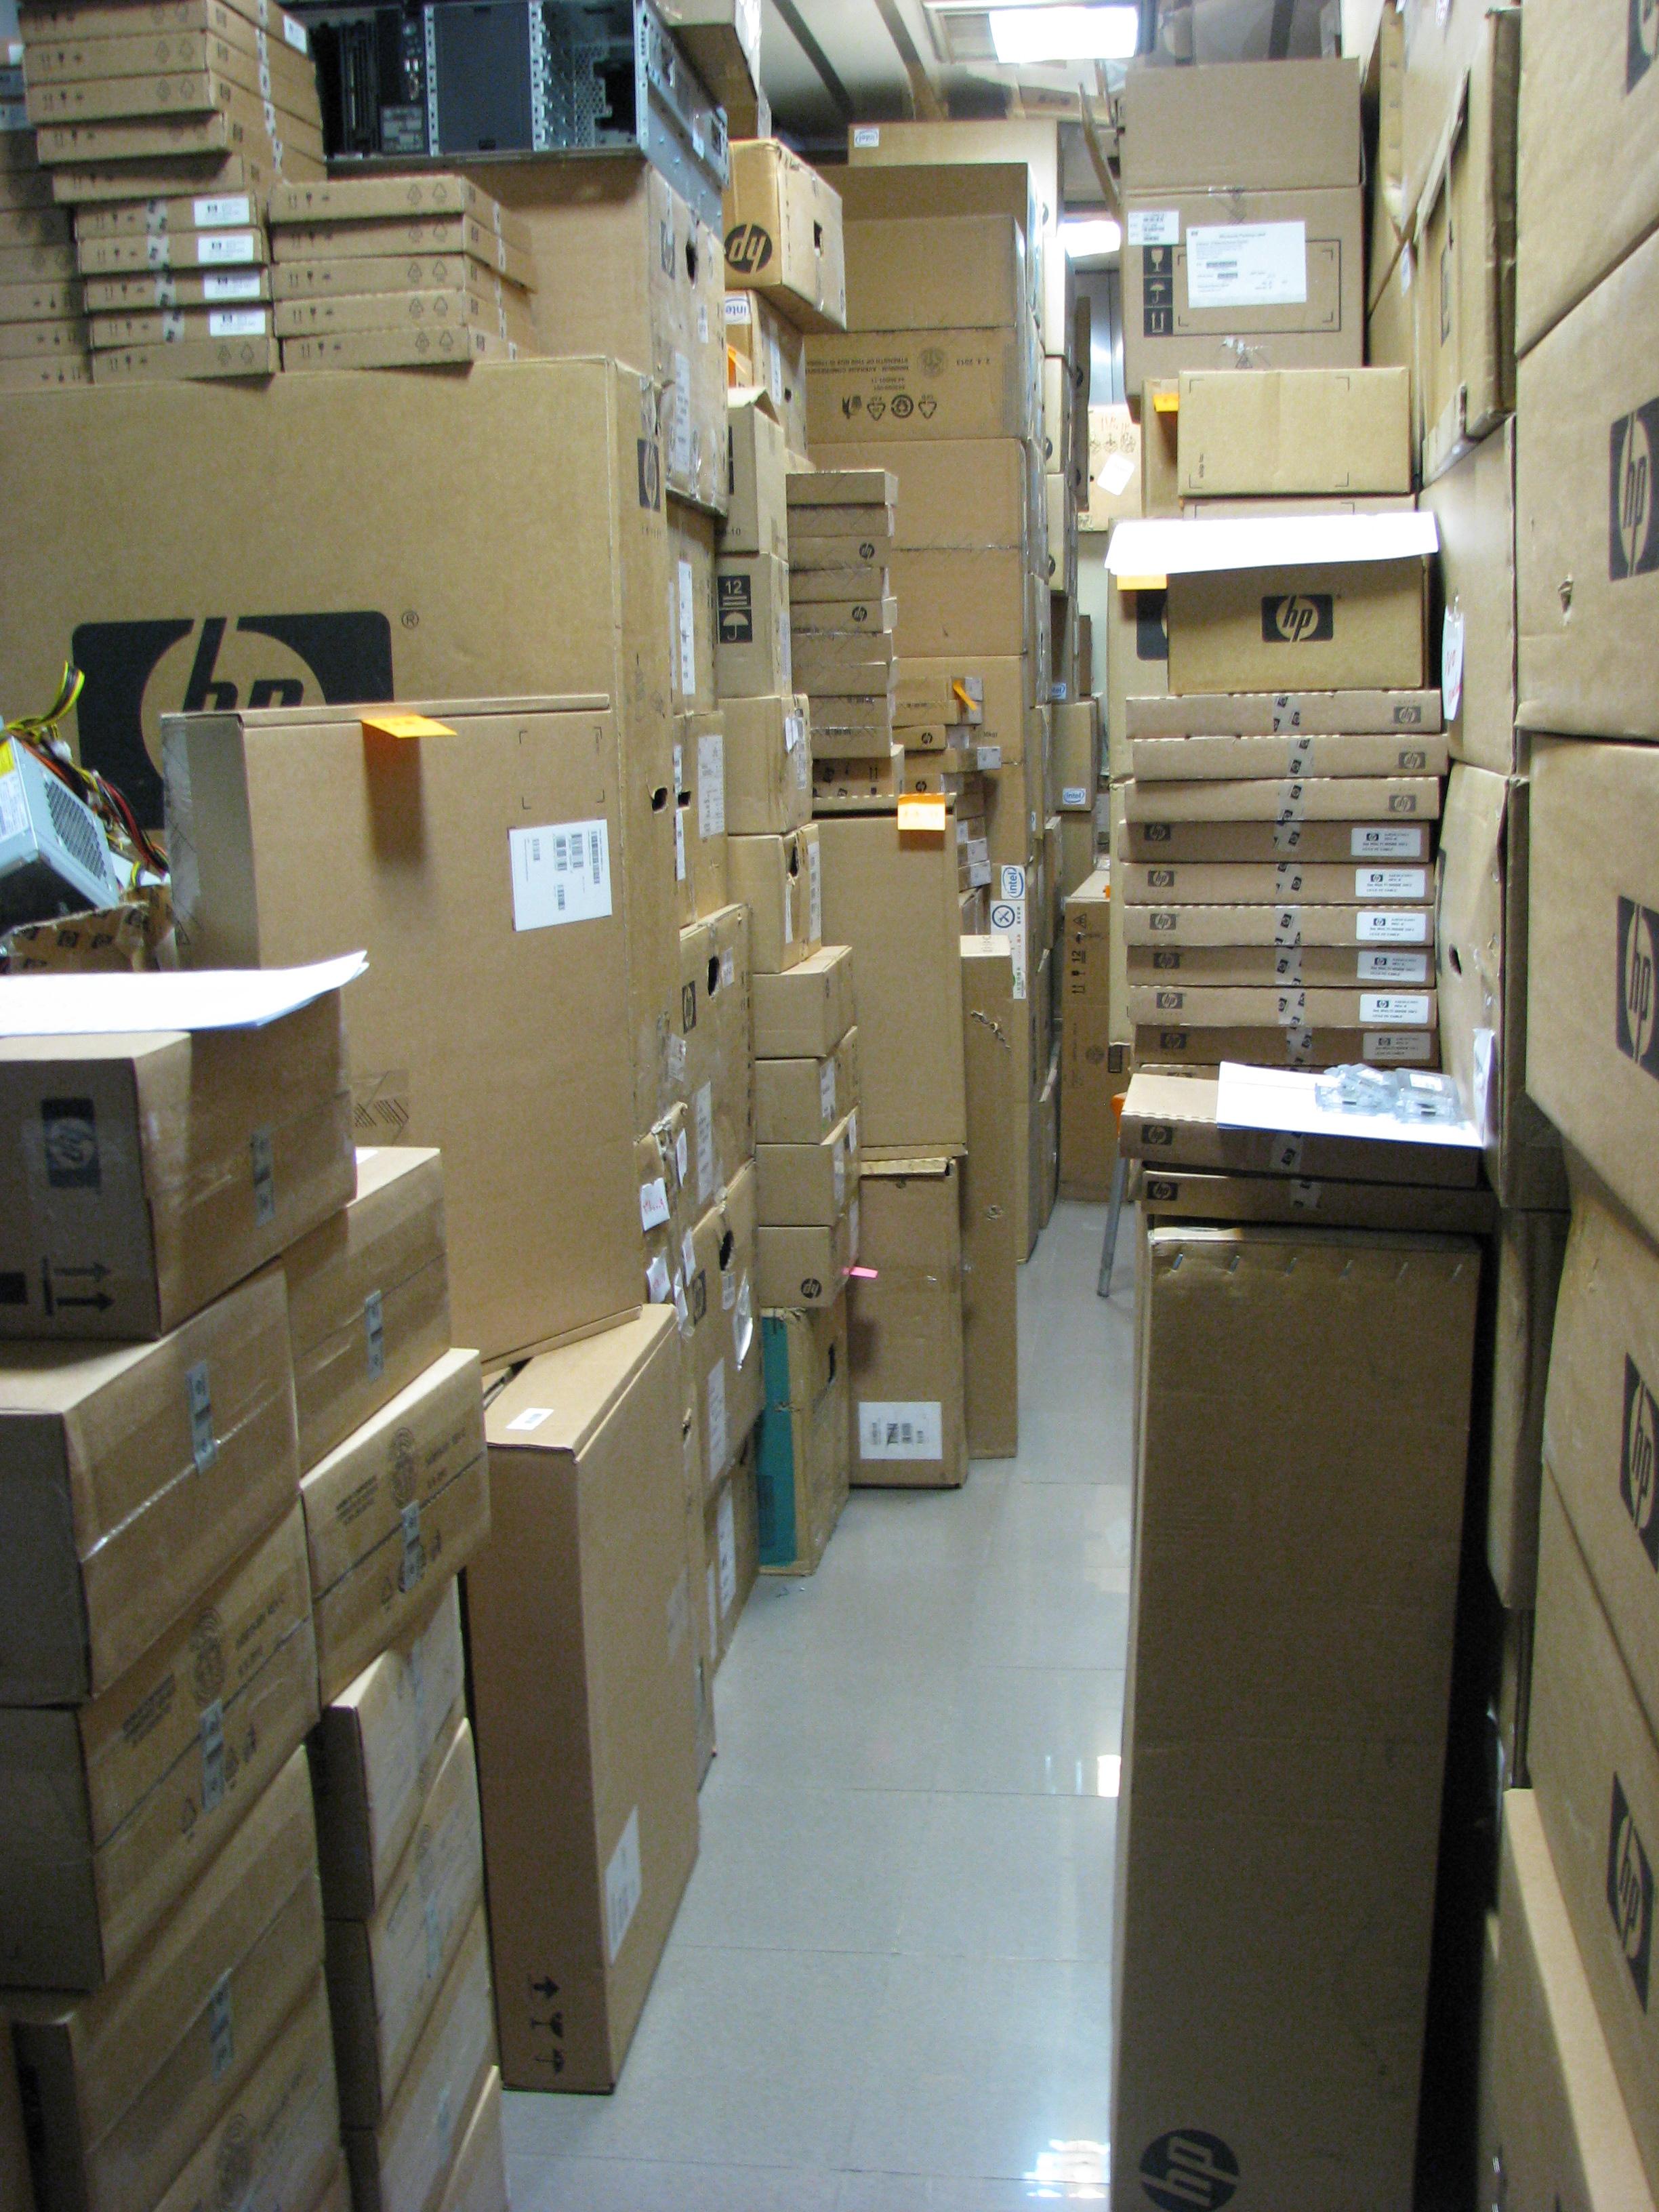 IMG 4853 - نمايندگي, اچپي,  dl380g9, server, hp, سرور, سرور hp, hp سرور, G9, سرورML310,